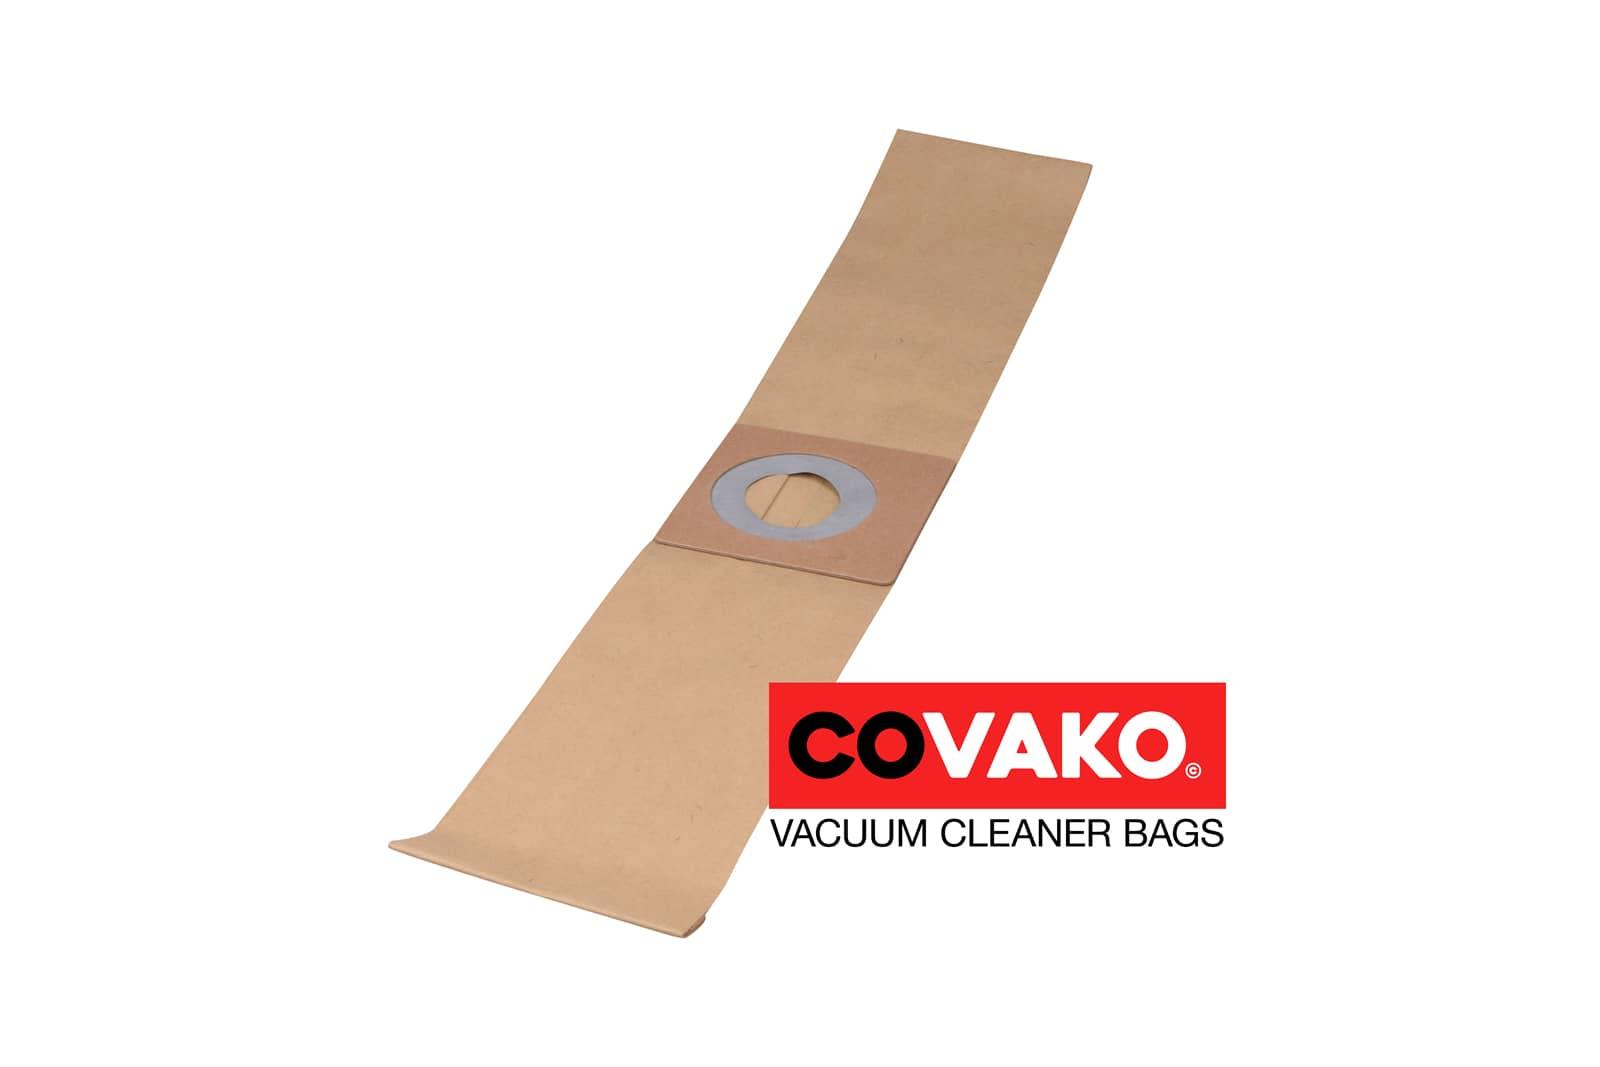 Fakir Micro / Papier - Fakir stofzuigerzakken